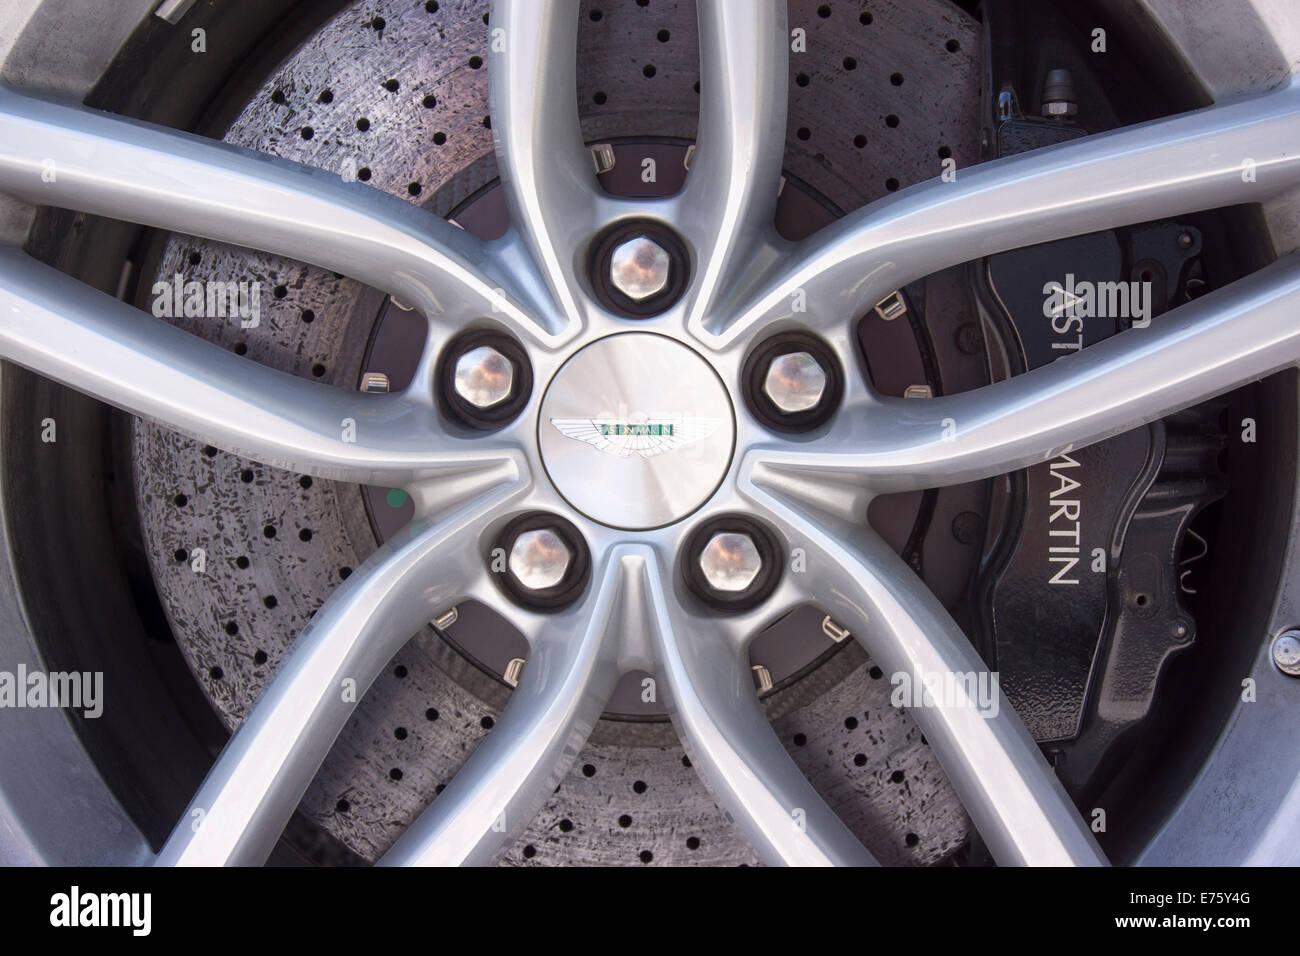 Wheel rim with a carbon brake disc, Aston Martin DB9, 2012 model - Stock Image